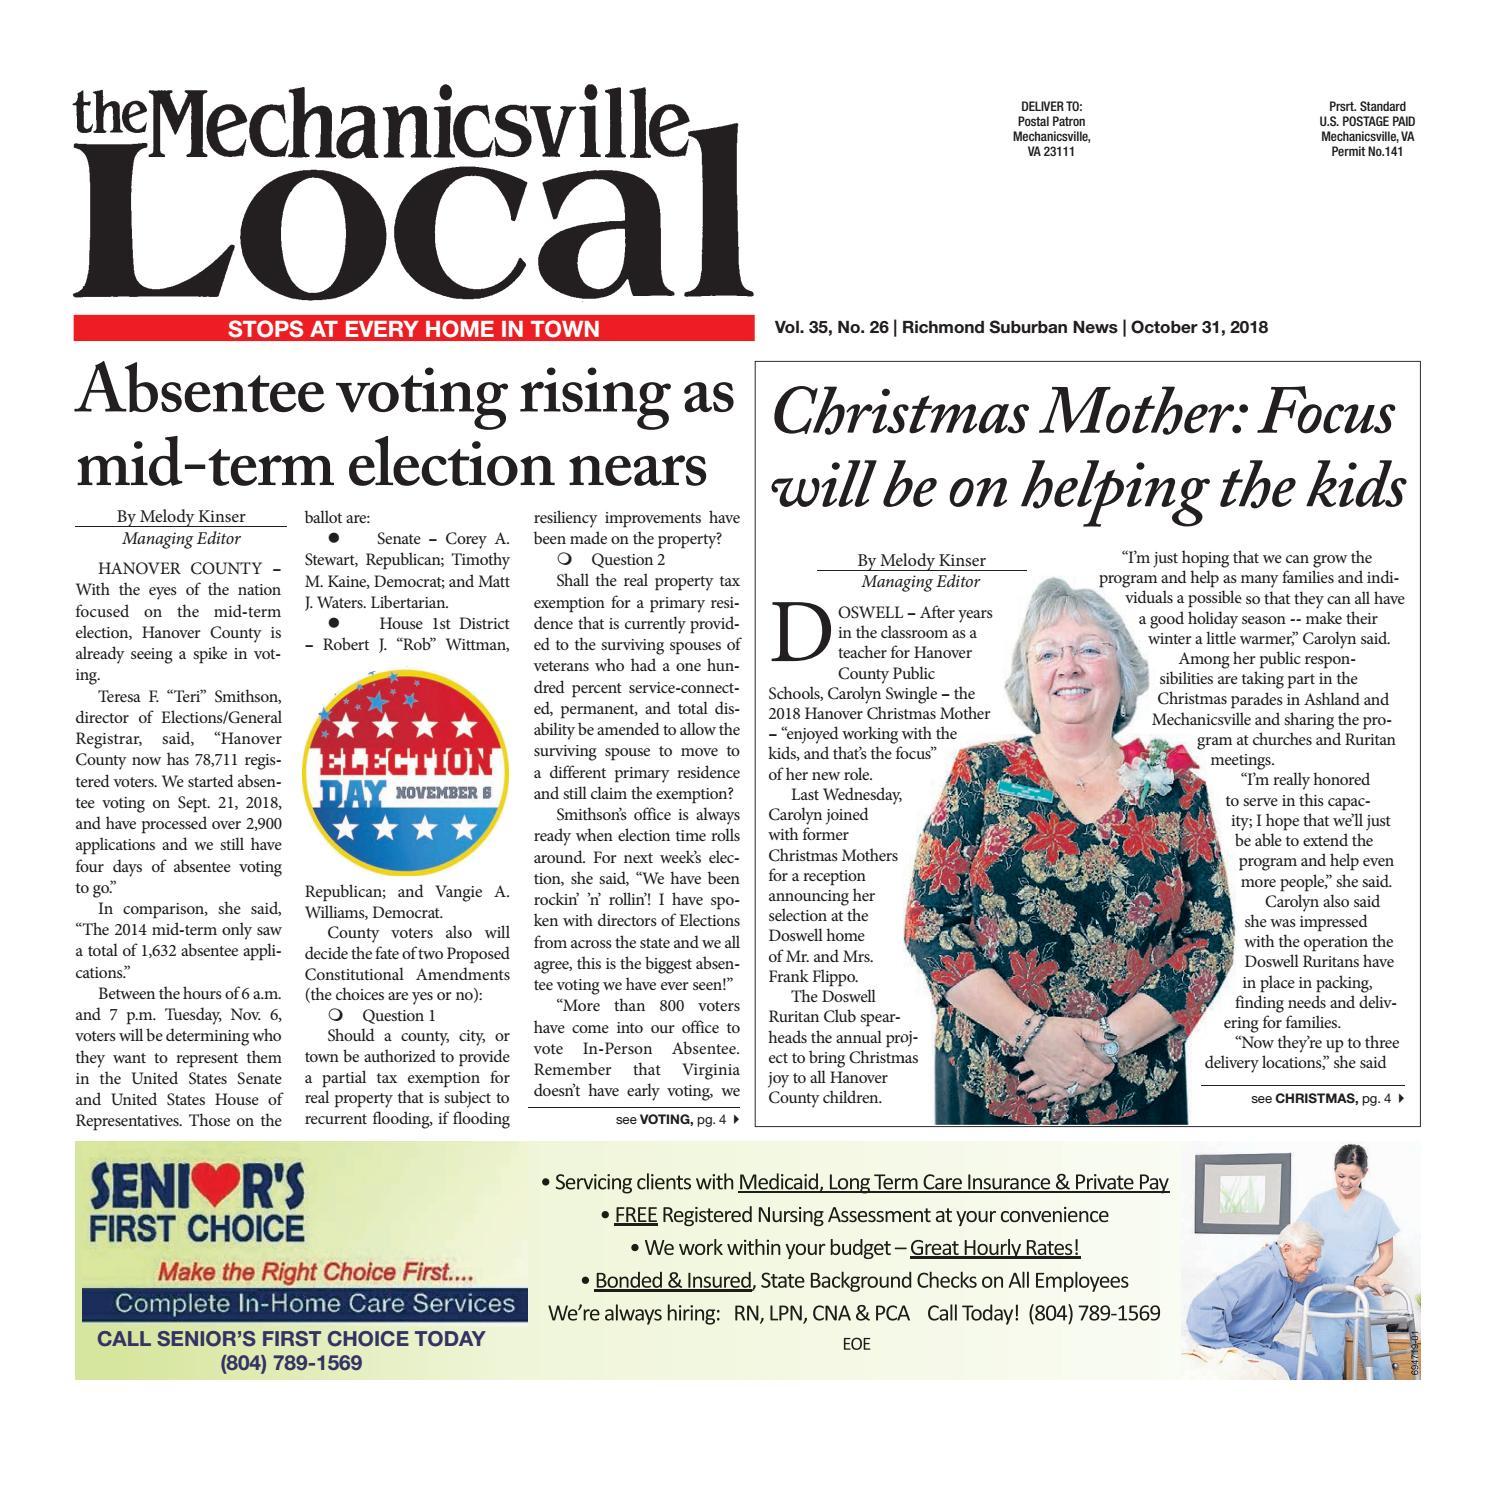 10 31 18 by The Mechanicsville Local - issuu 8743db9b487c